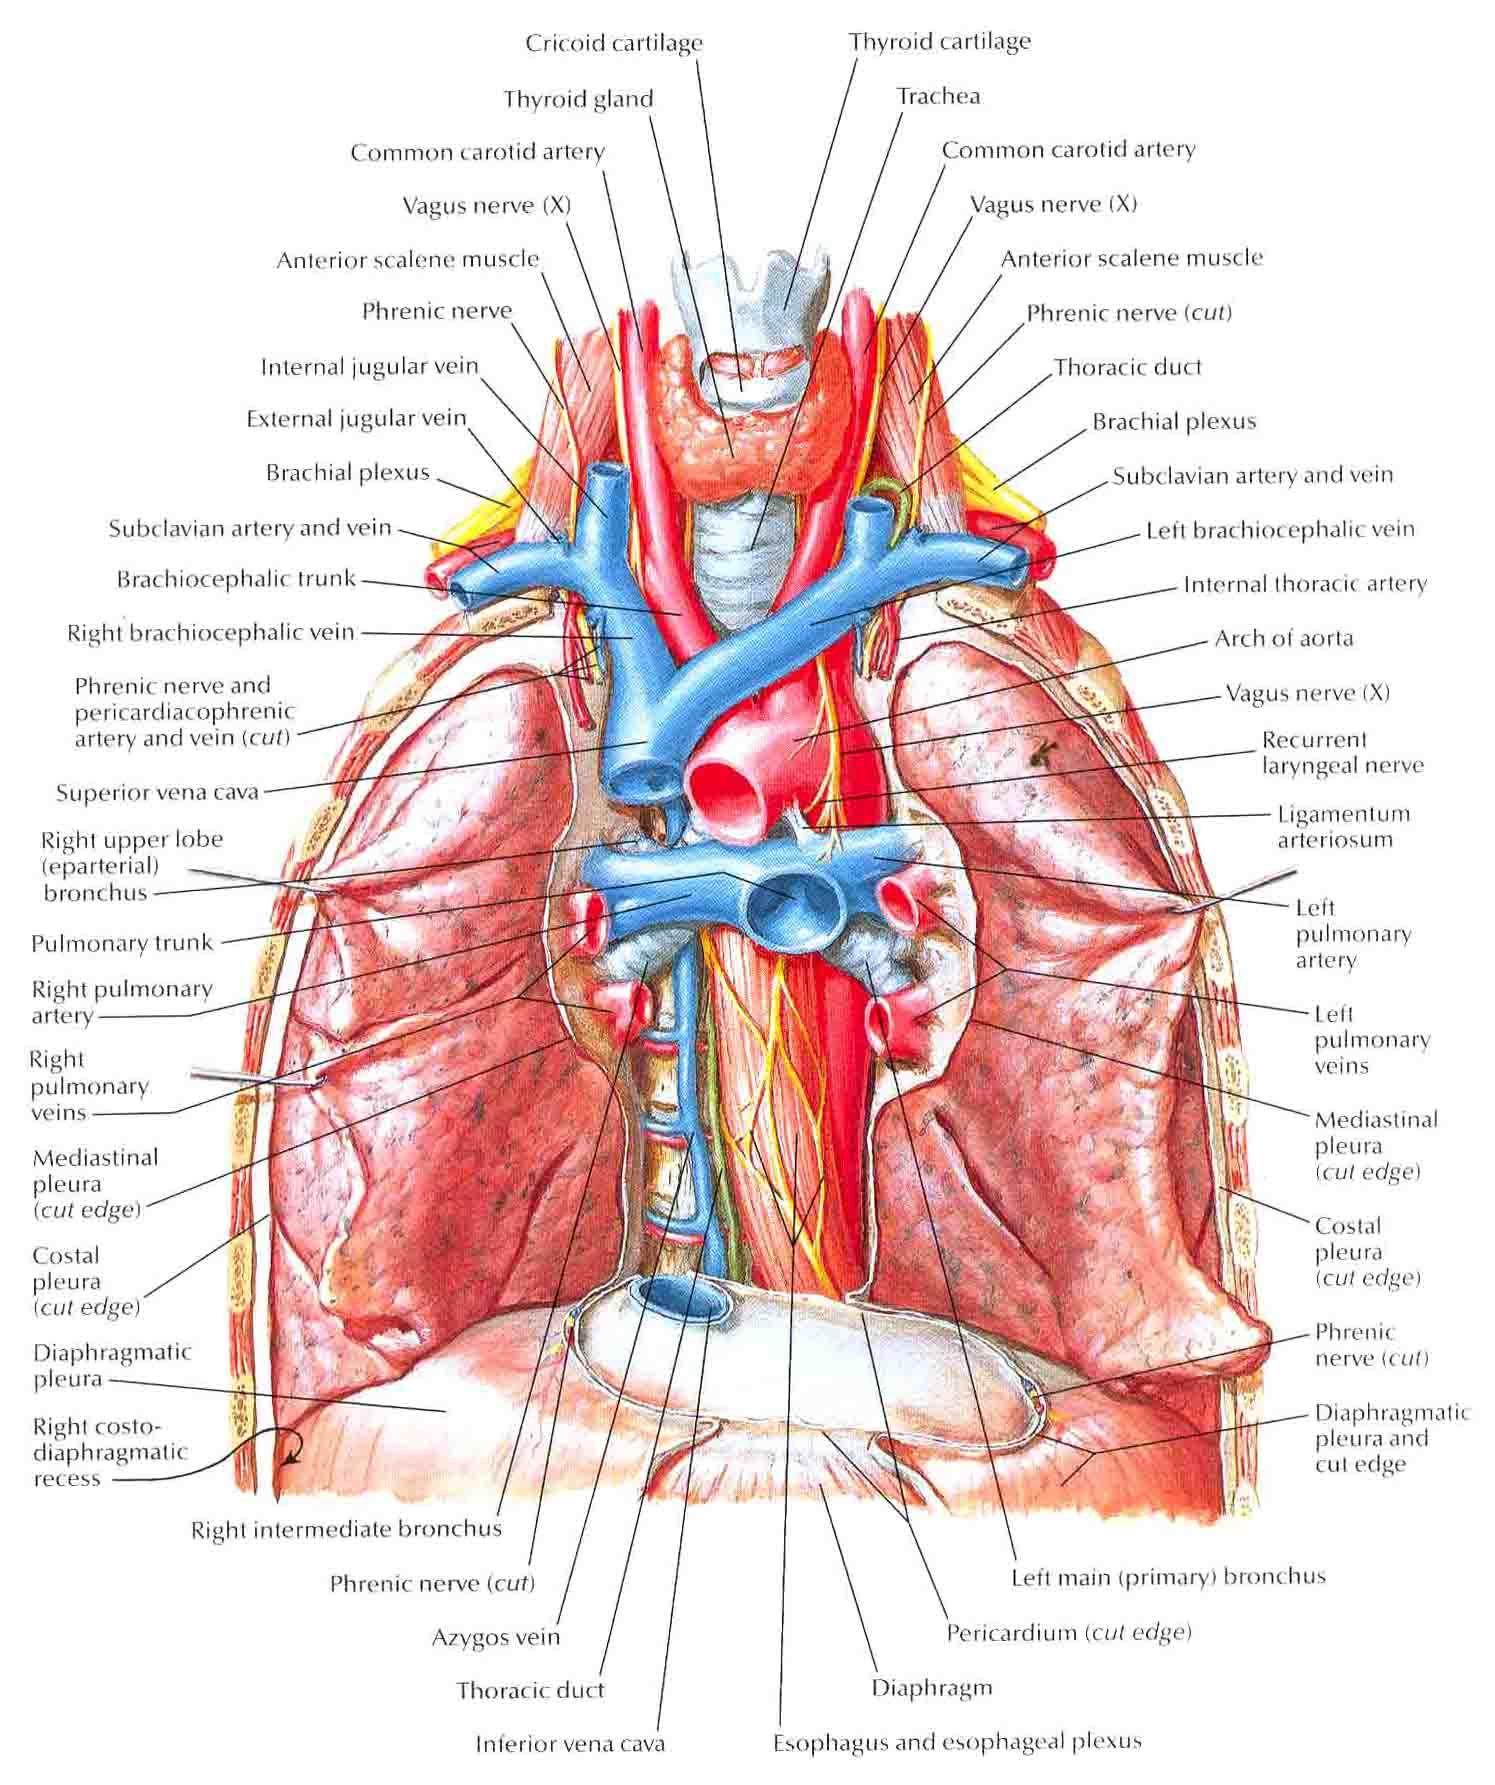 Lung Anatomy - Pulmonary Artery Function | Anatomy & Physiology ...